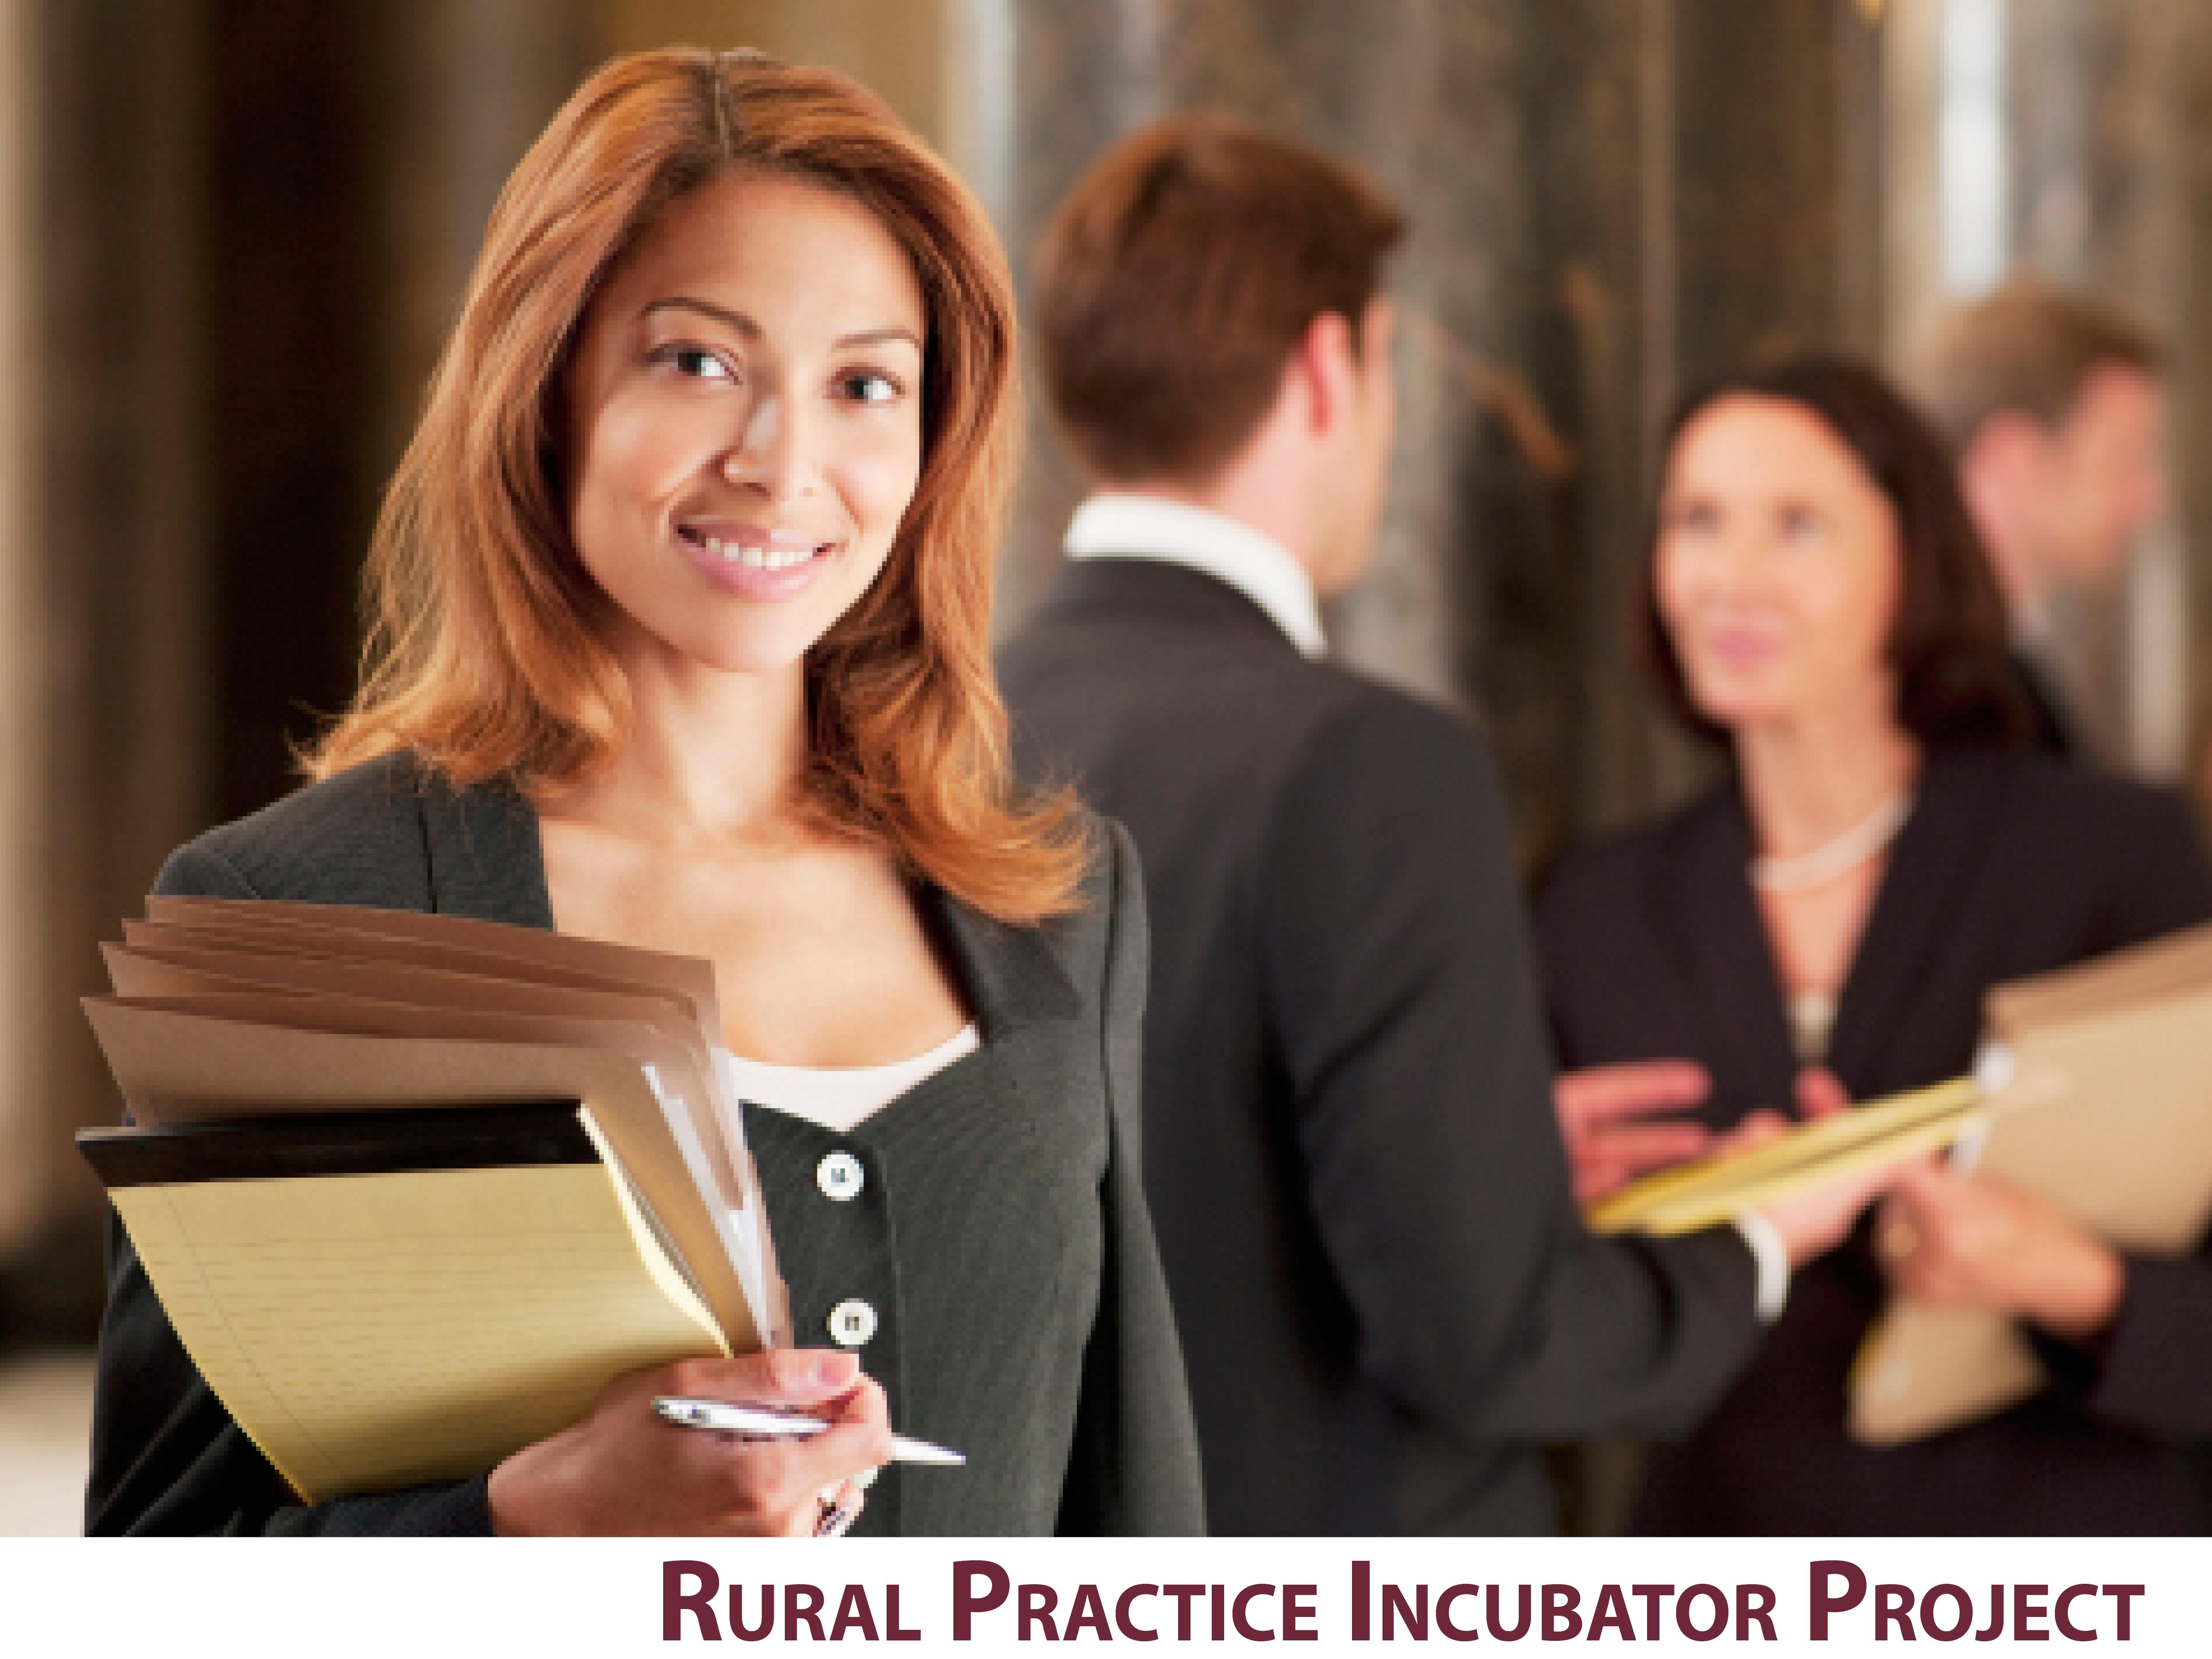 Rural Practice Incubator Project